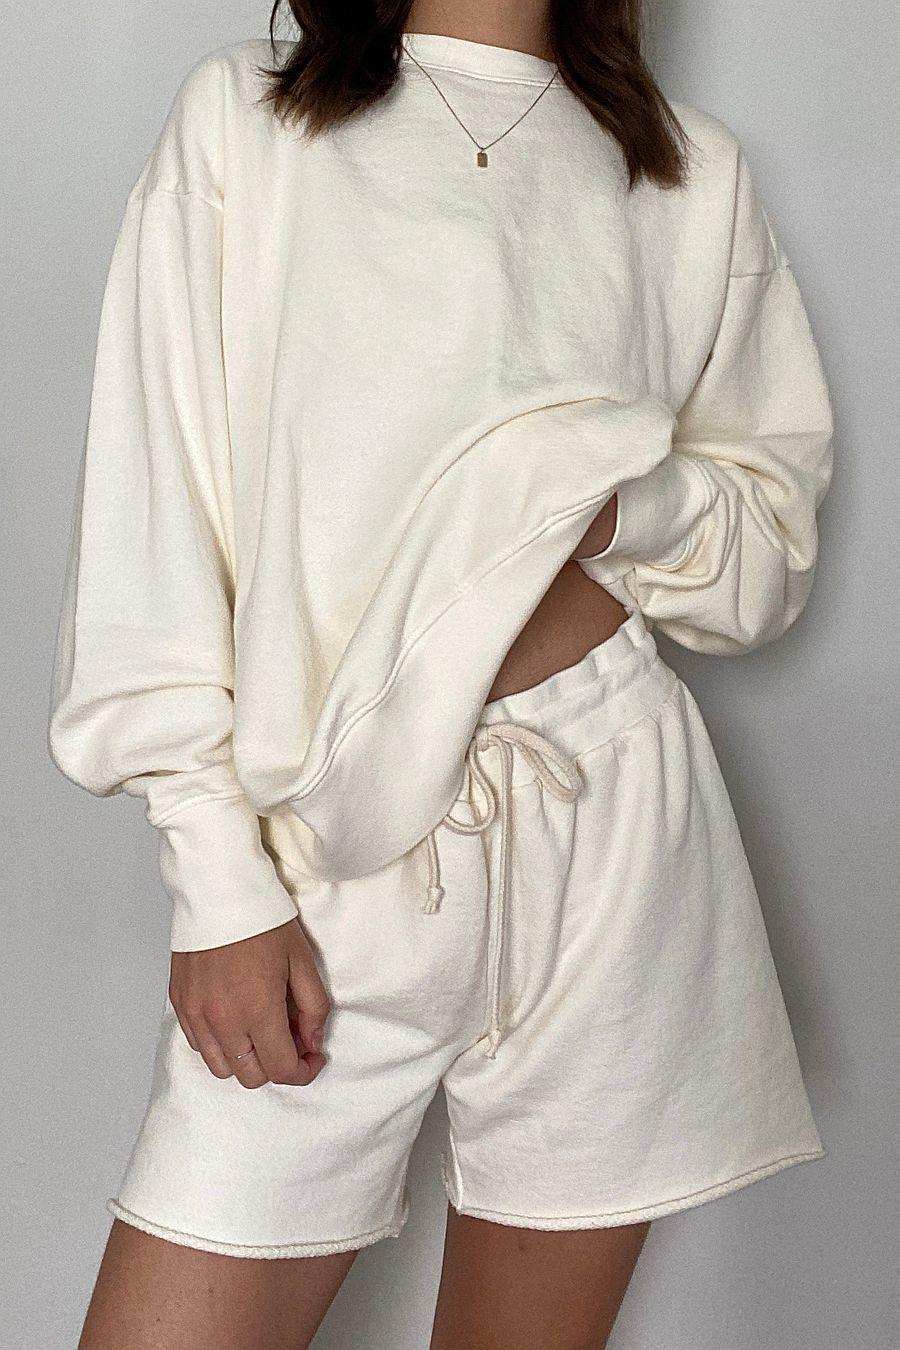 LACAUSA Clothing Slater Sweatshorts - Oatmilk